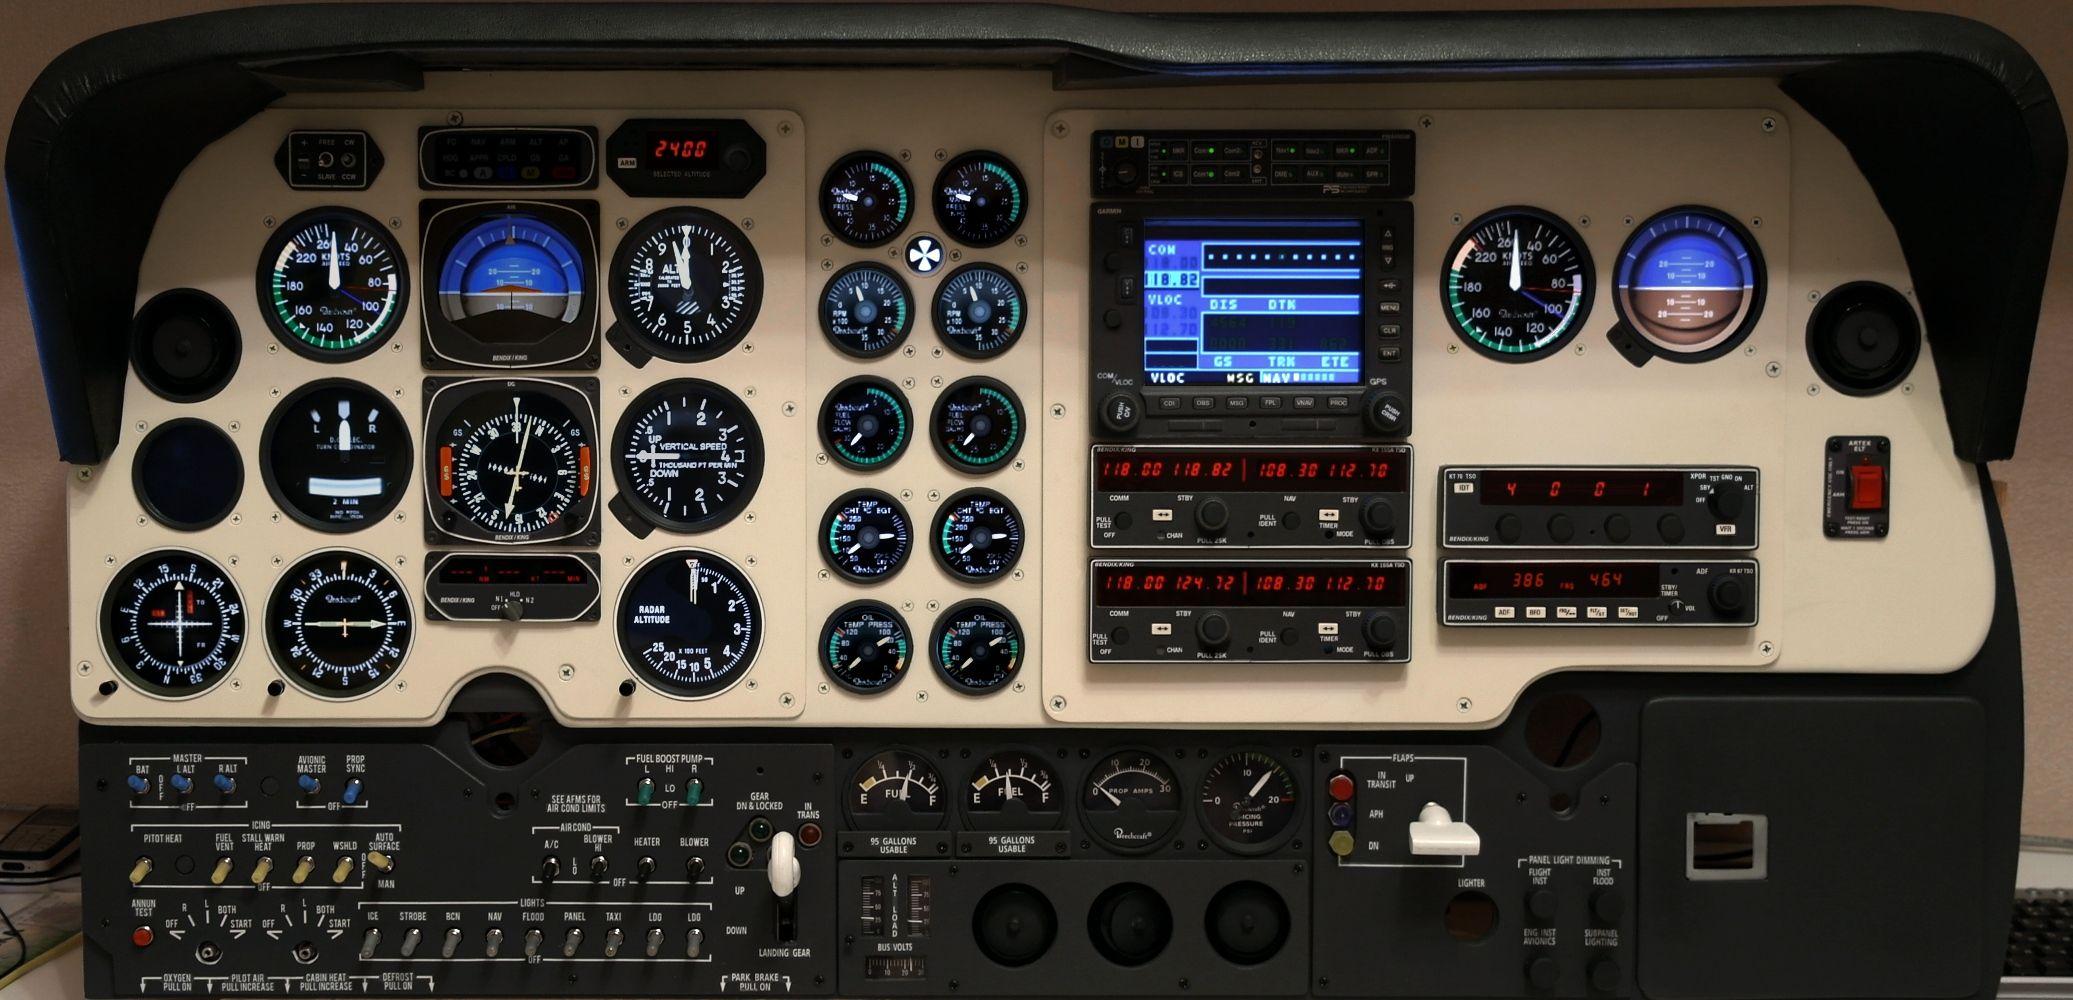 Baron home cockpit simulator project arduino